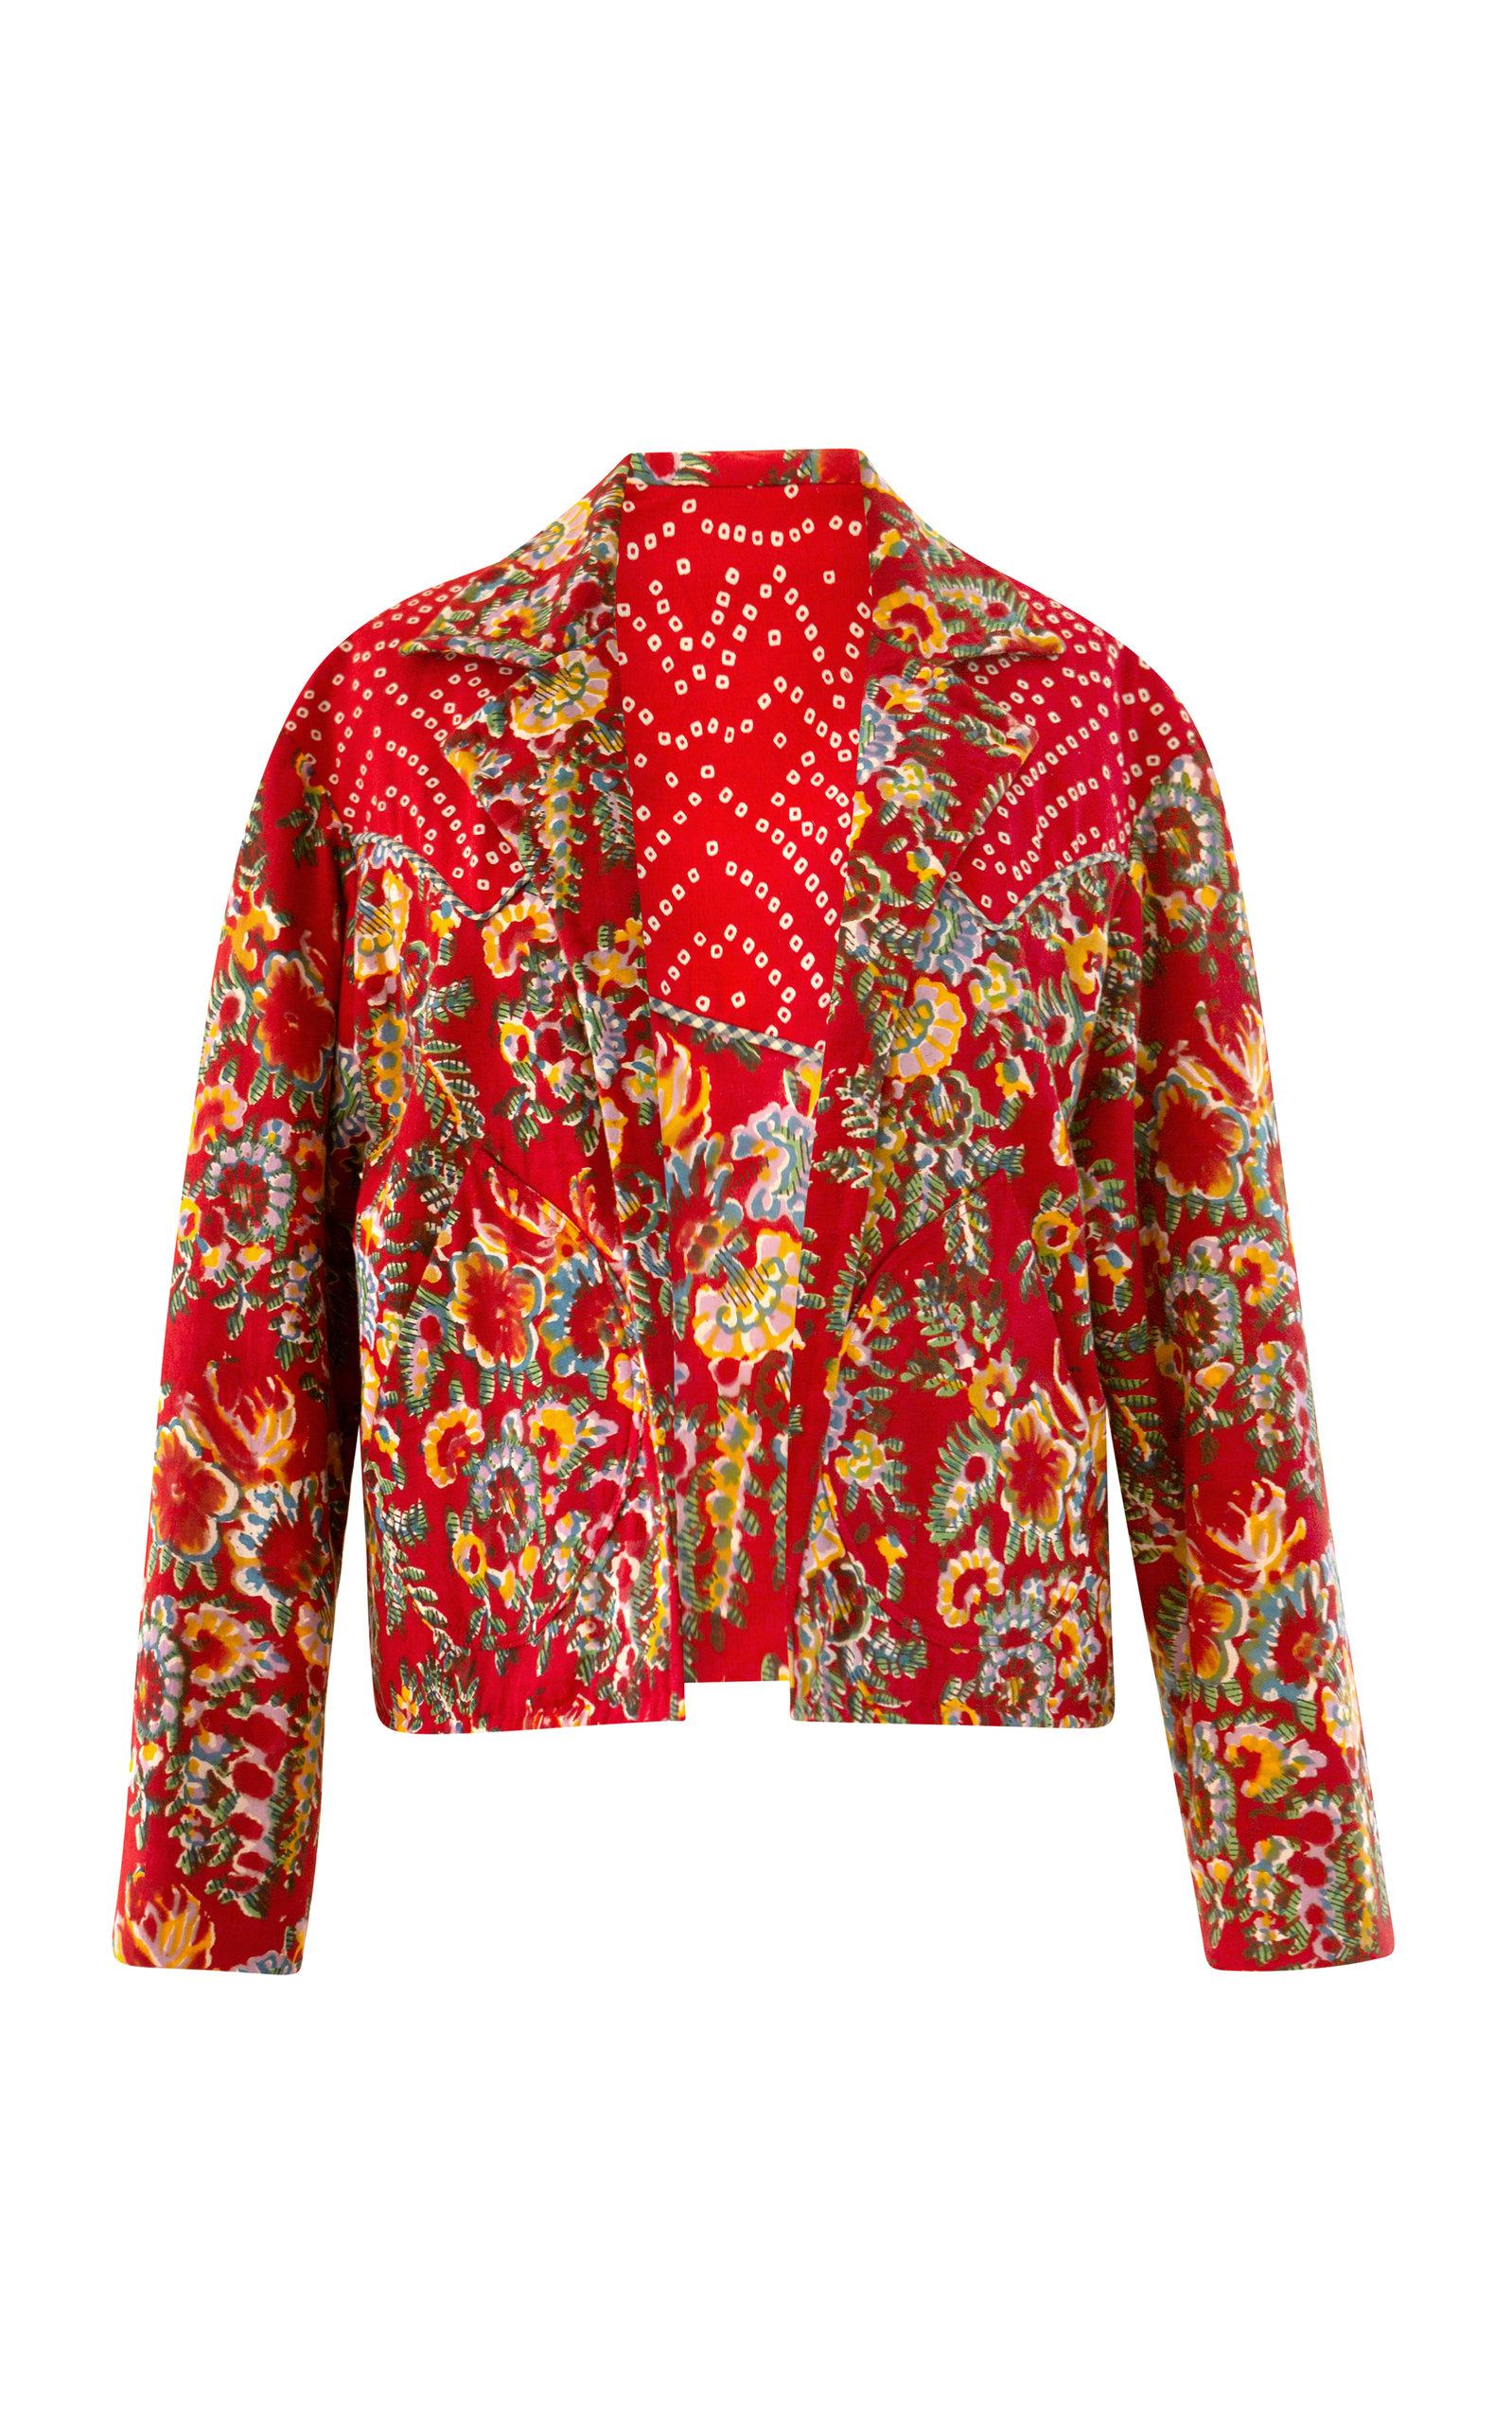 Alix of Bohemia - Women's Dune Rosemary Print Jacket - Print - Moda Operandi